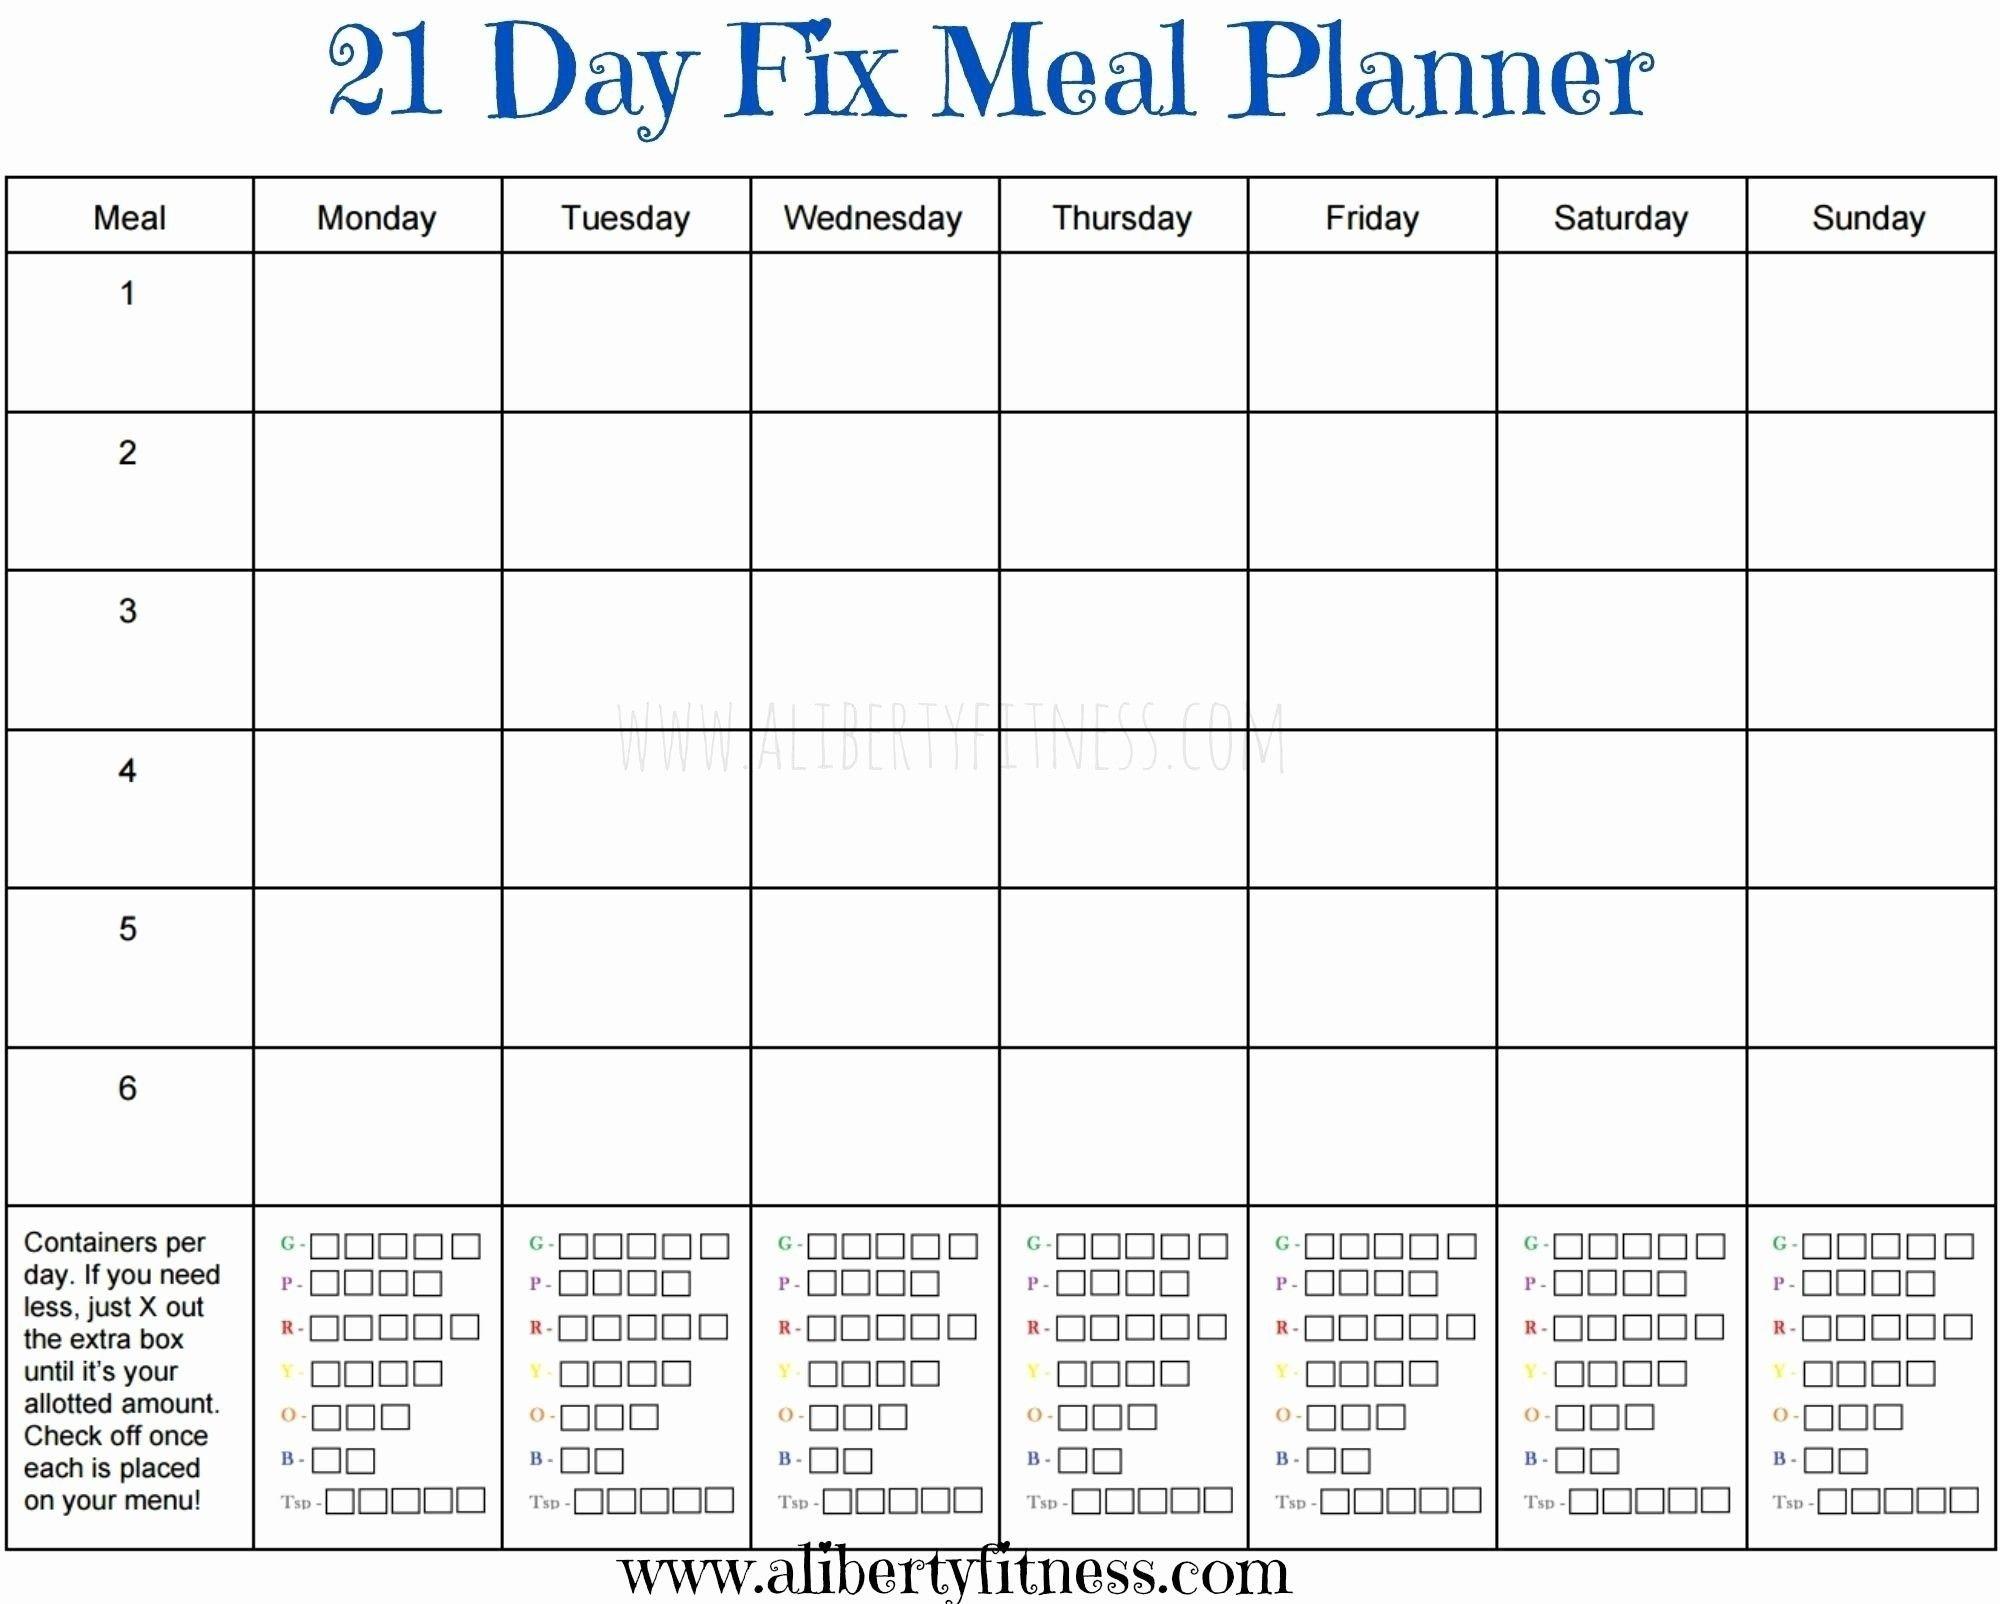 Get August 2019 Calendar Printable Org   21 Day Fix 21 Day Calendar Template